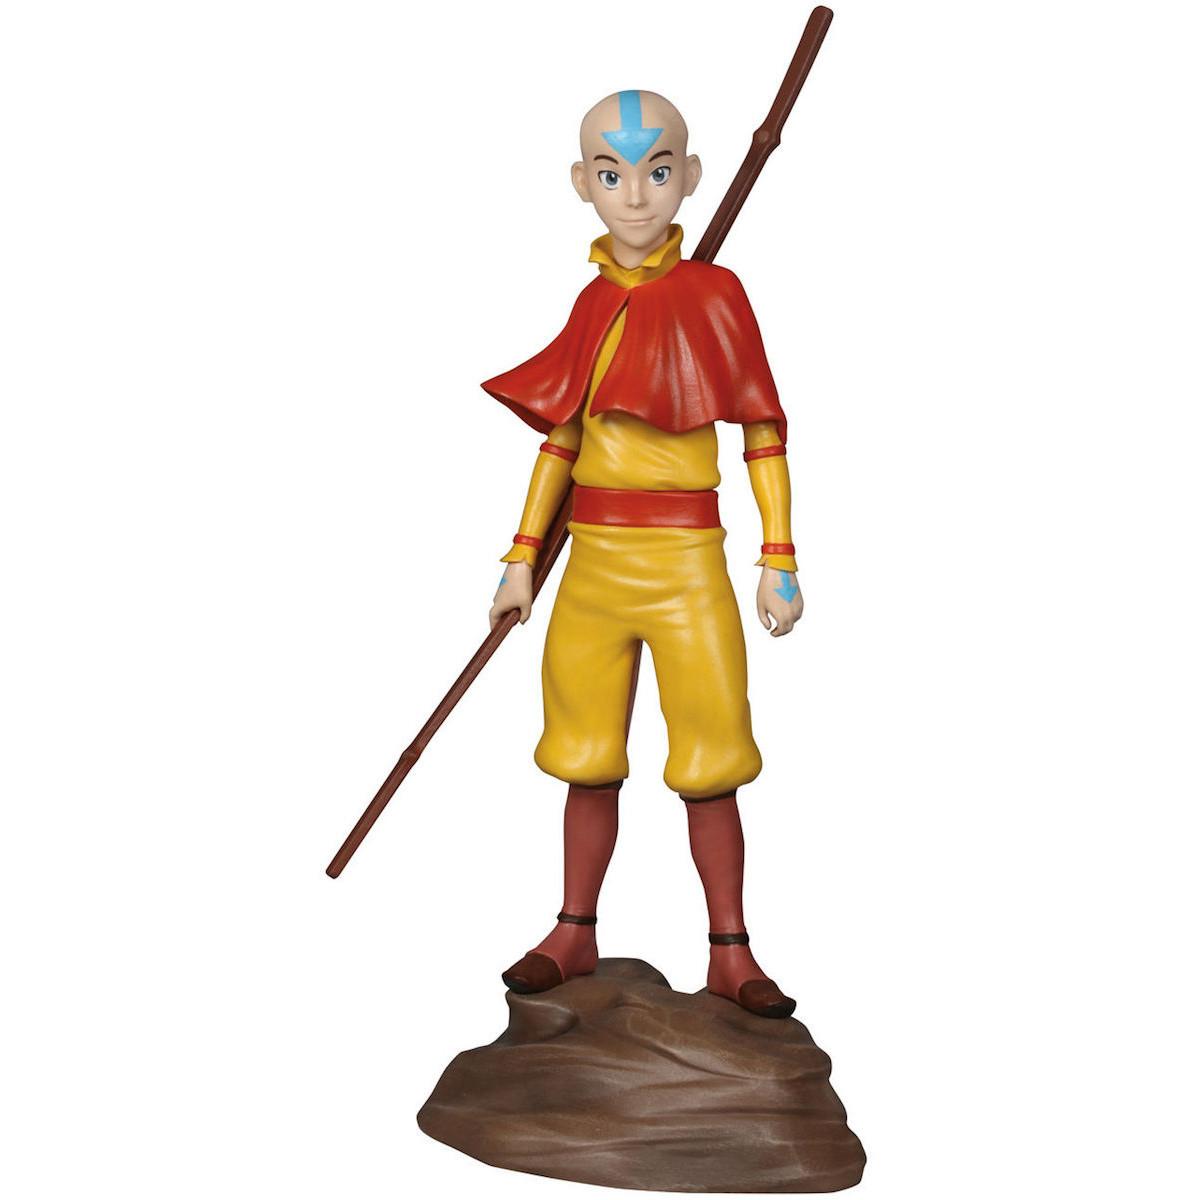 Avatar Ang: Avatar: The Last Airbender Aang Statue